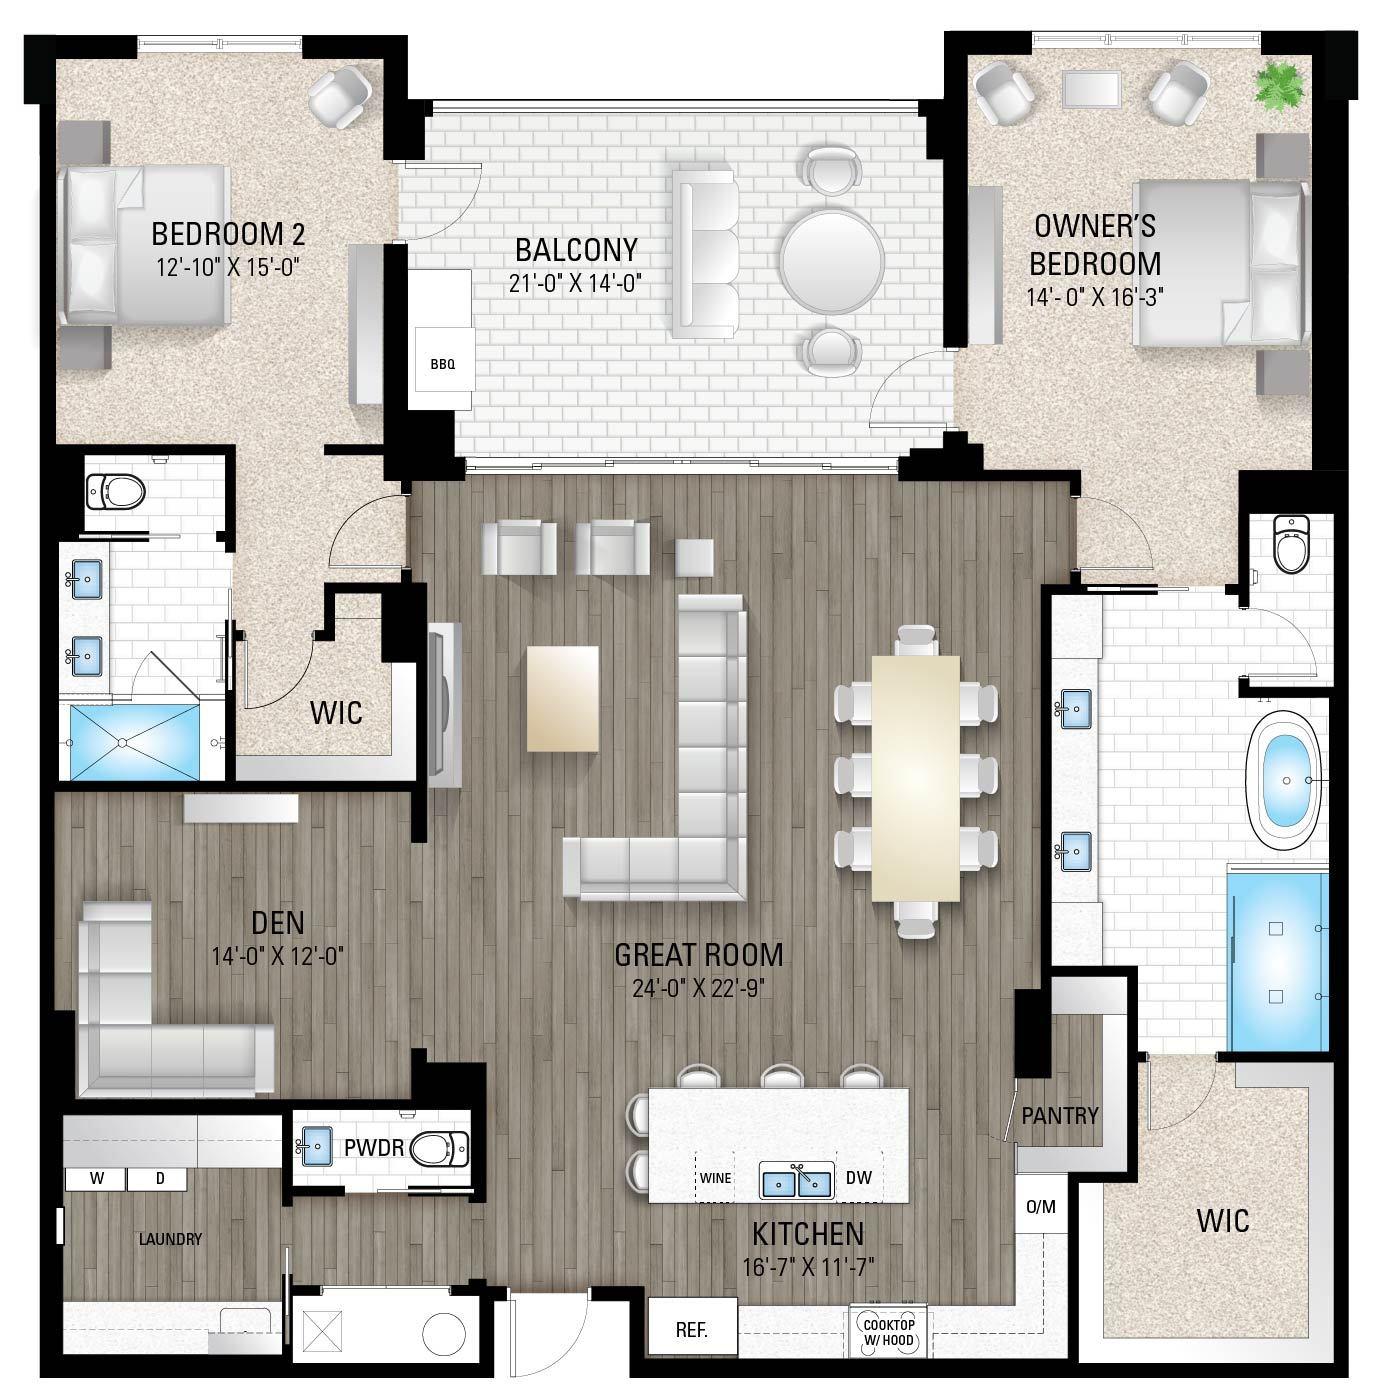 Captiva 3:2 Bedrooms / 2.5 Baths / Den